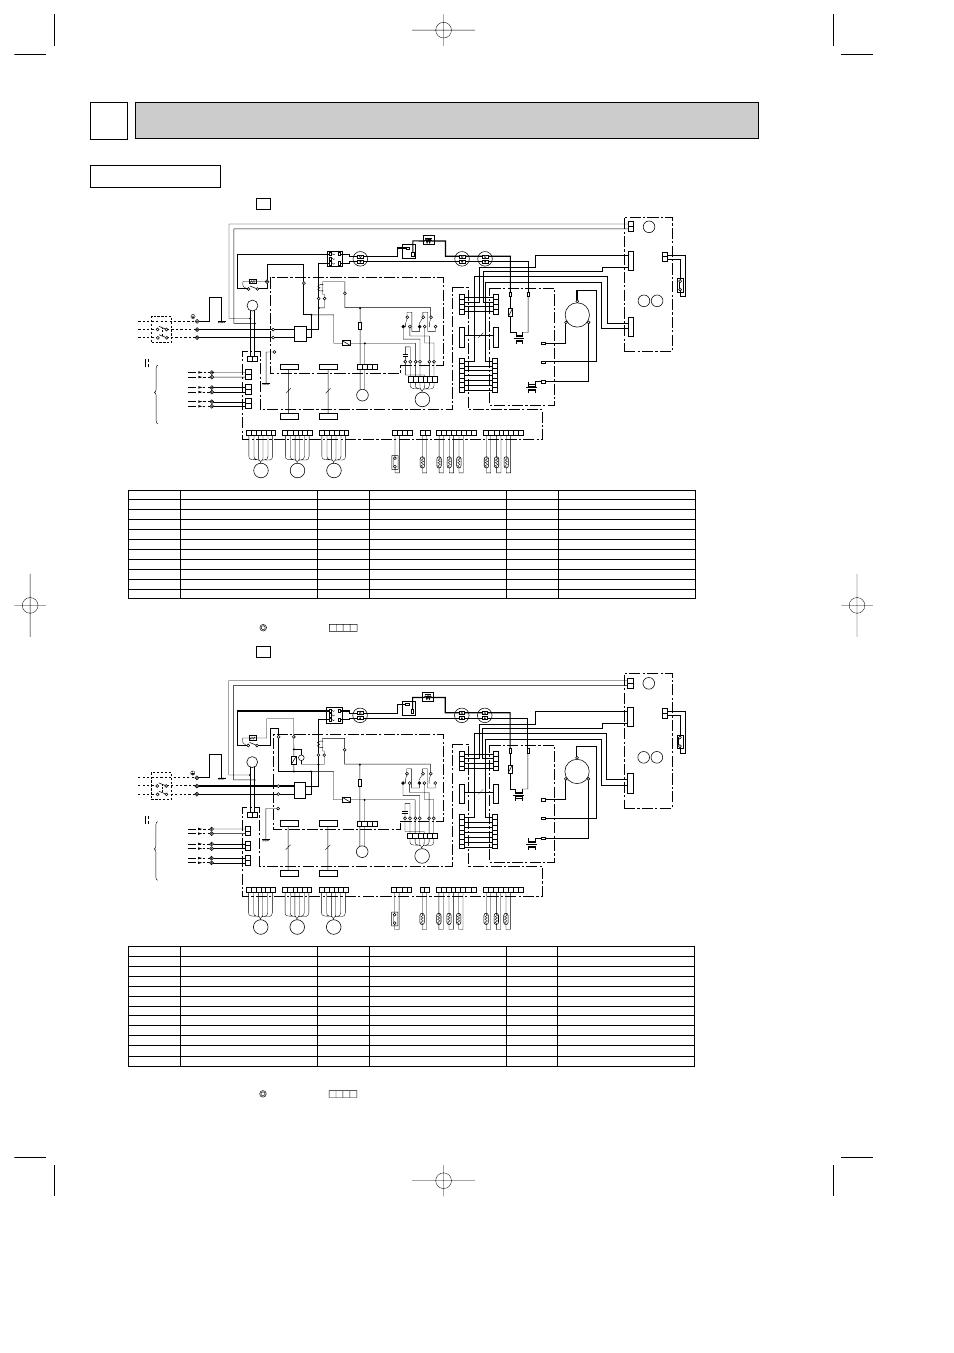 hight resolution of wiring diagram 8 models mxz 24uv outdoor unit mitsubishi mitsubishi electrical wiring diagrams